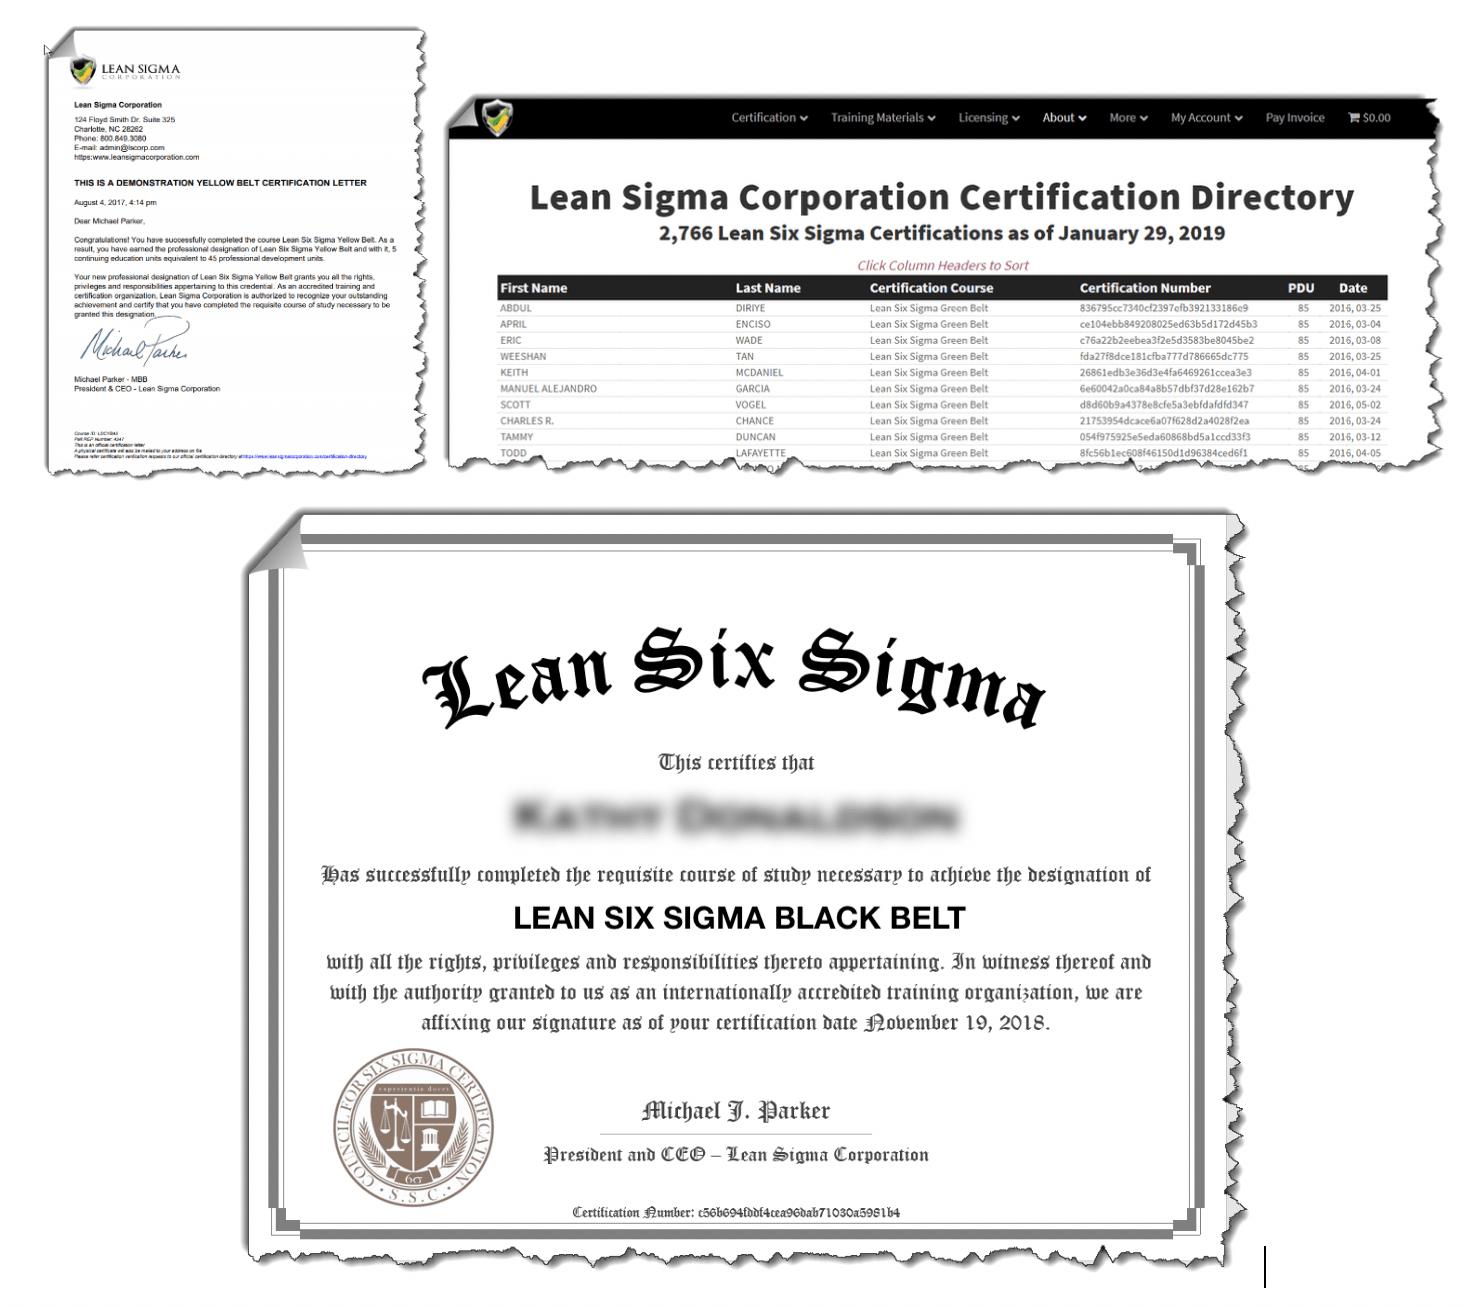 Lean Six Sigma Black Belt Certifications